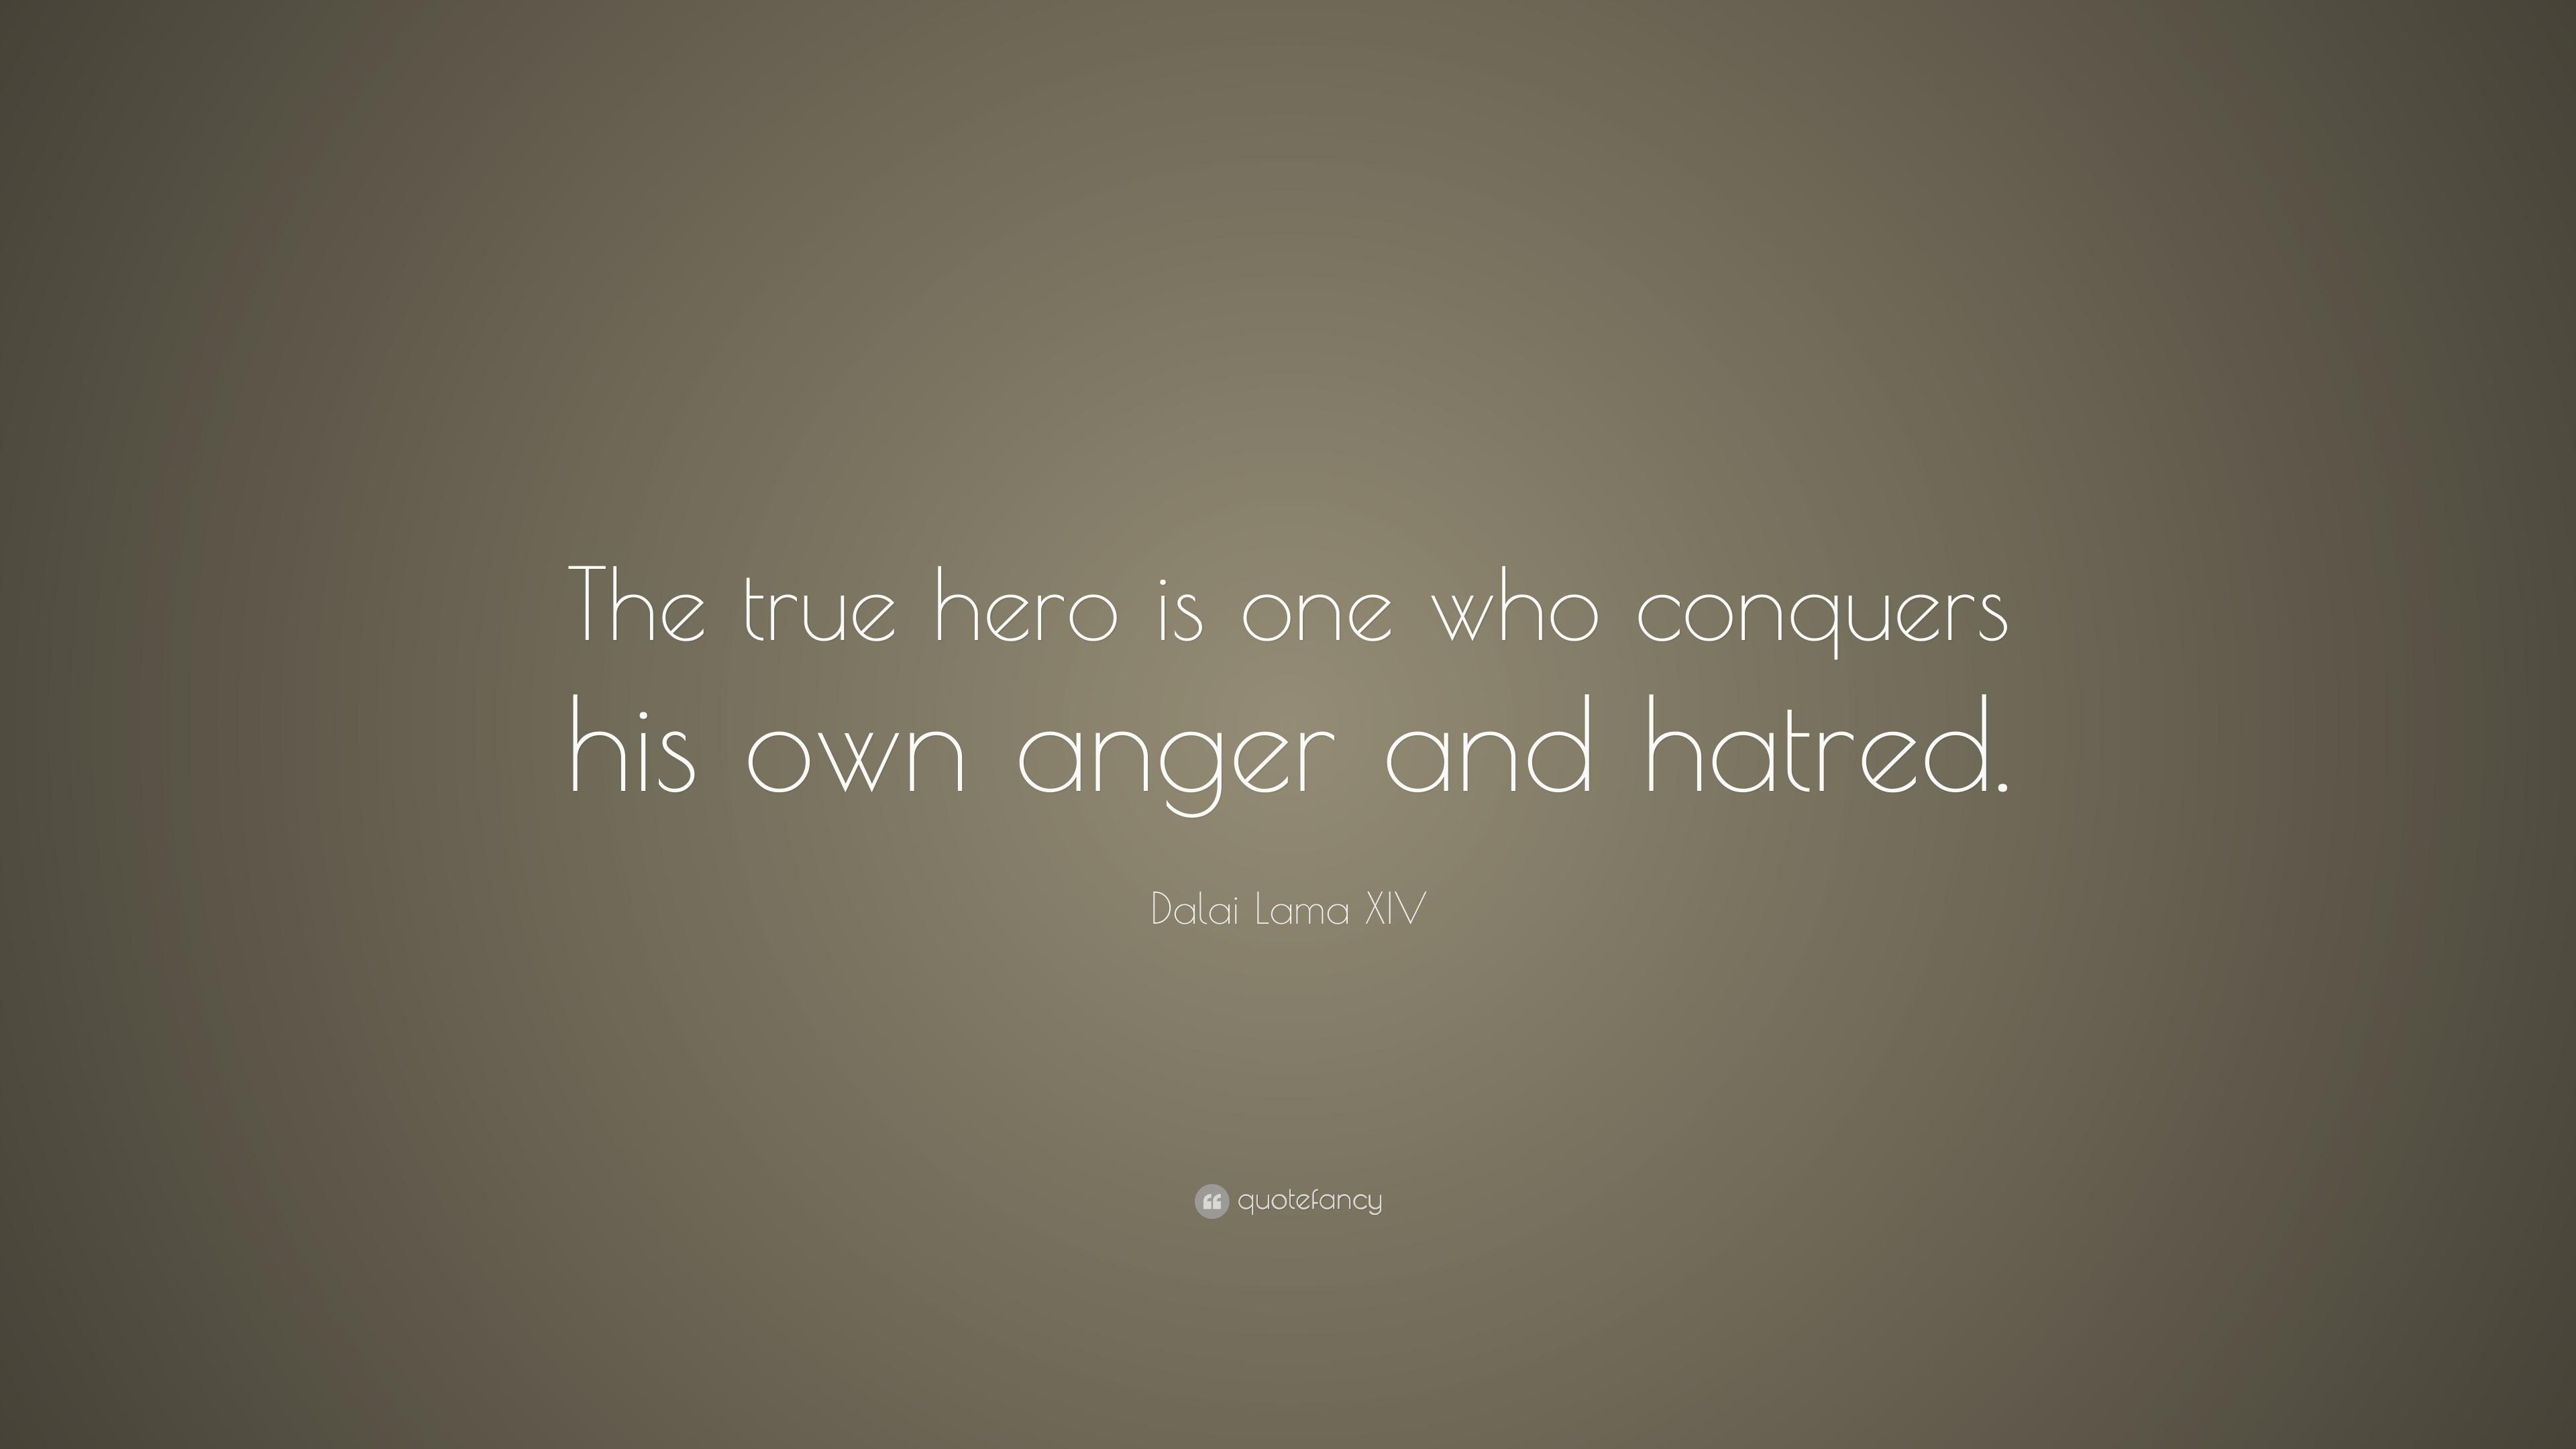 Dalai Lama Quotes Wallpapers Dalai Lama Xiv Quote The True Hero Is One Who Conquers